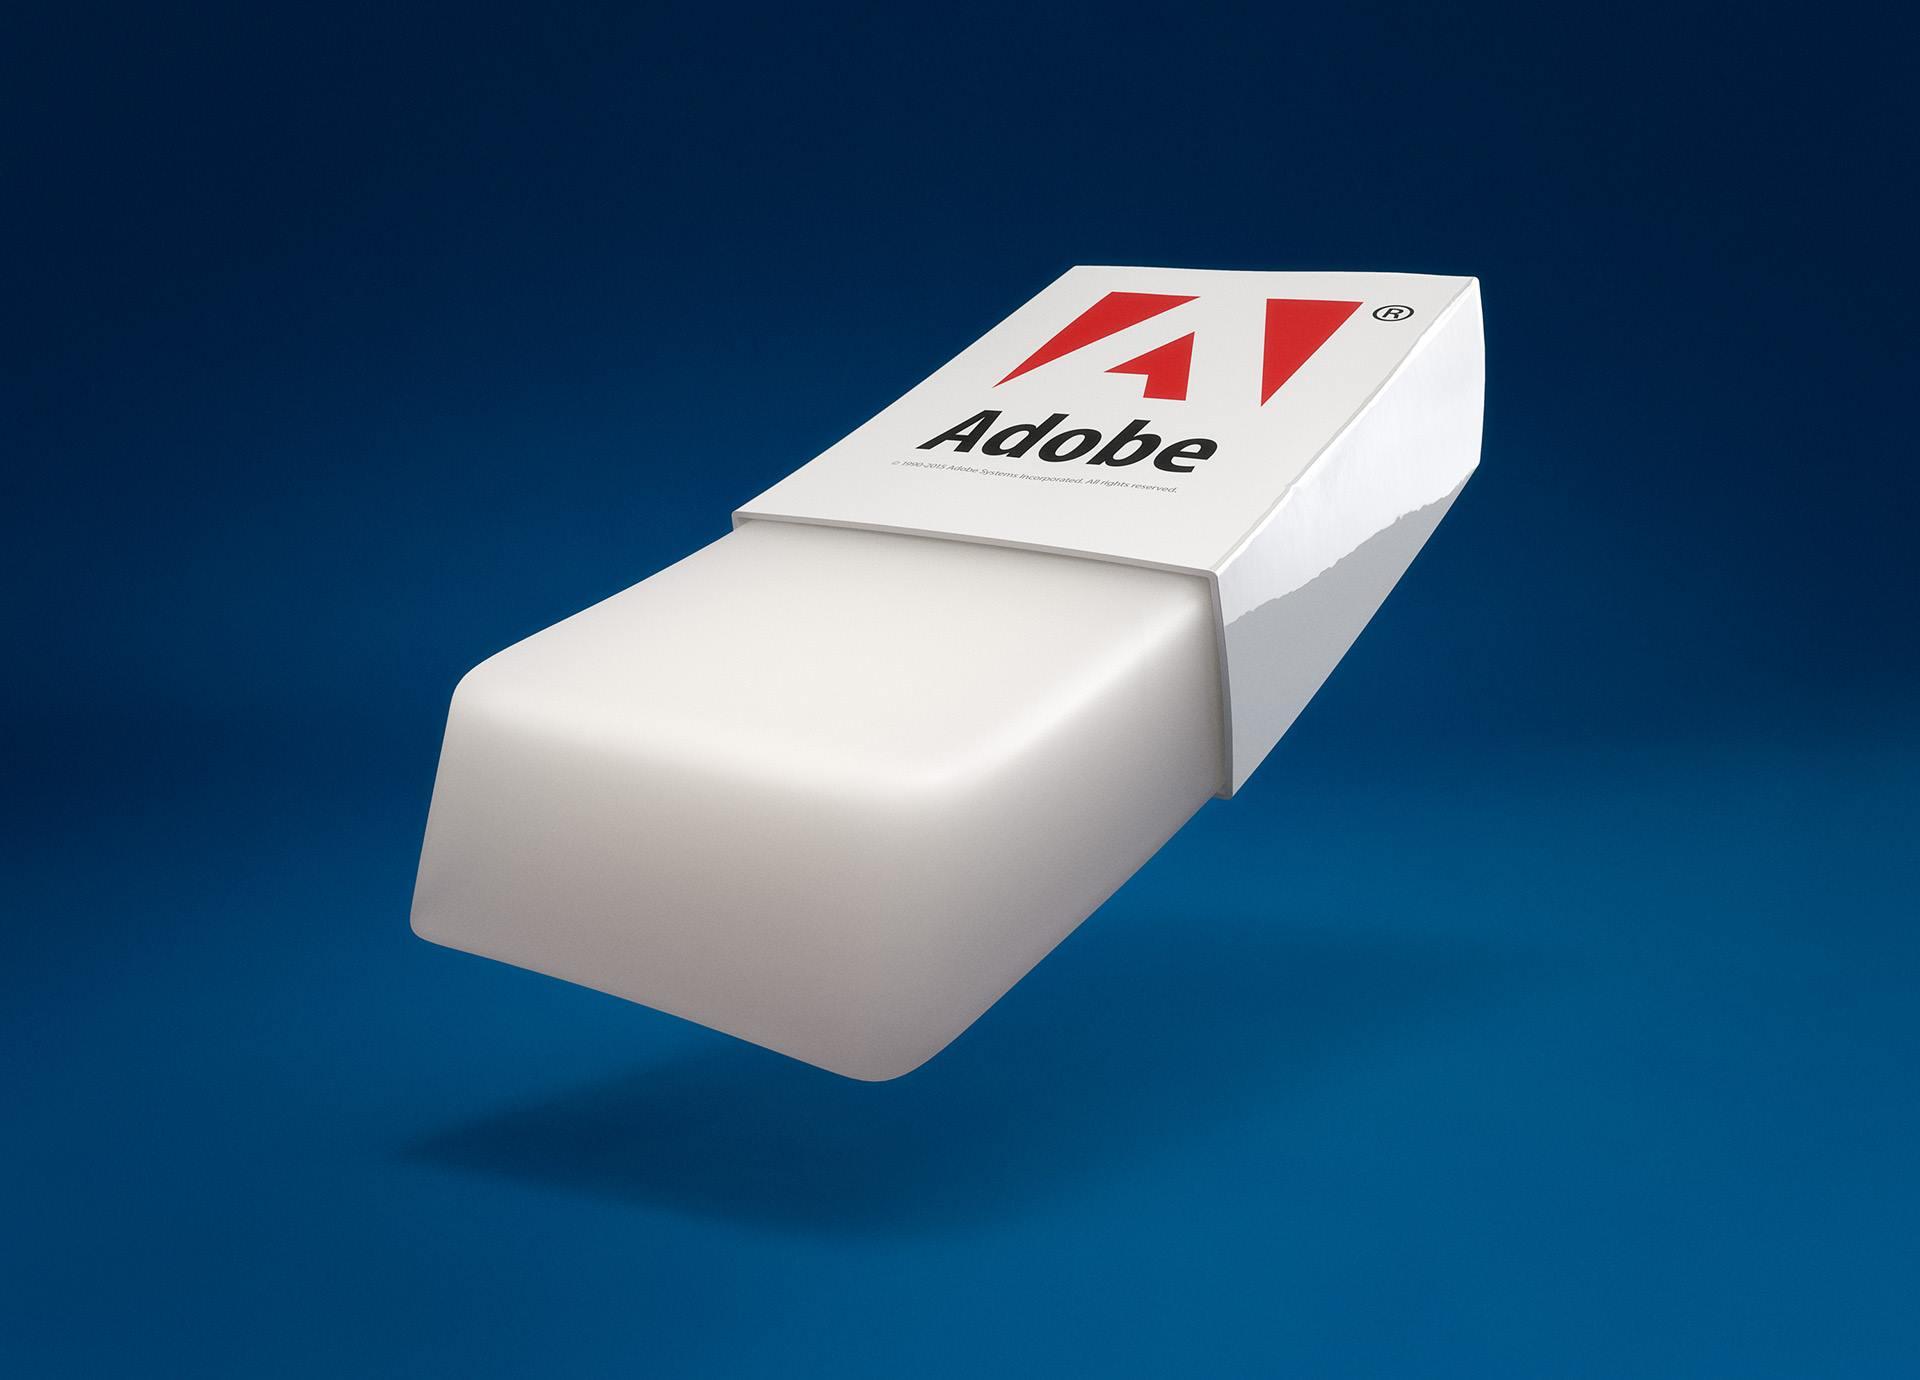 Eraser tool بالصور : تخيل شريط ادوات الفوتوشوب 3D